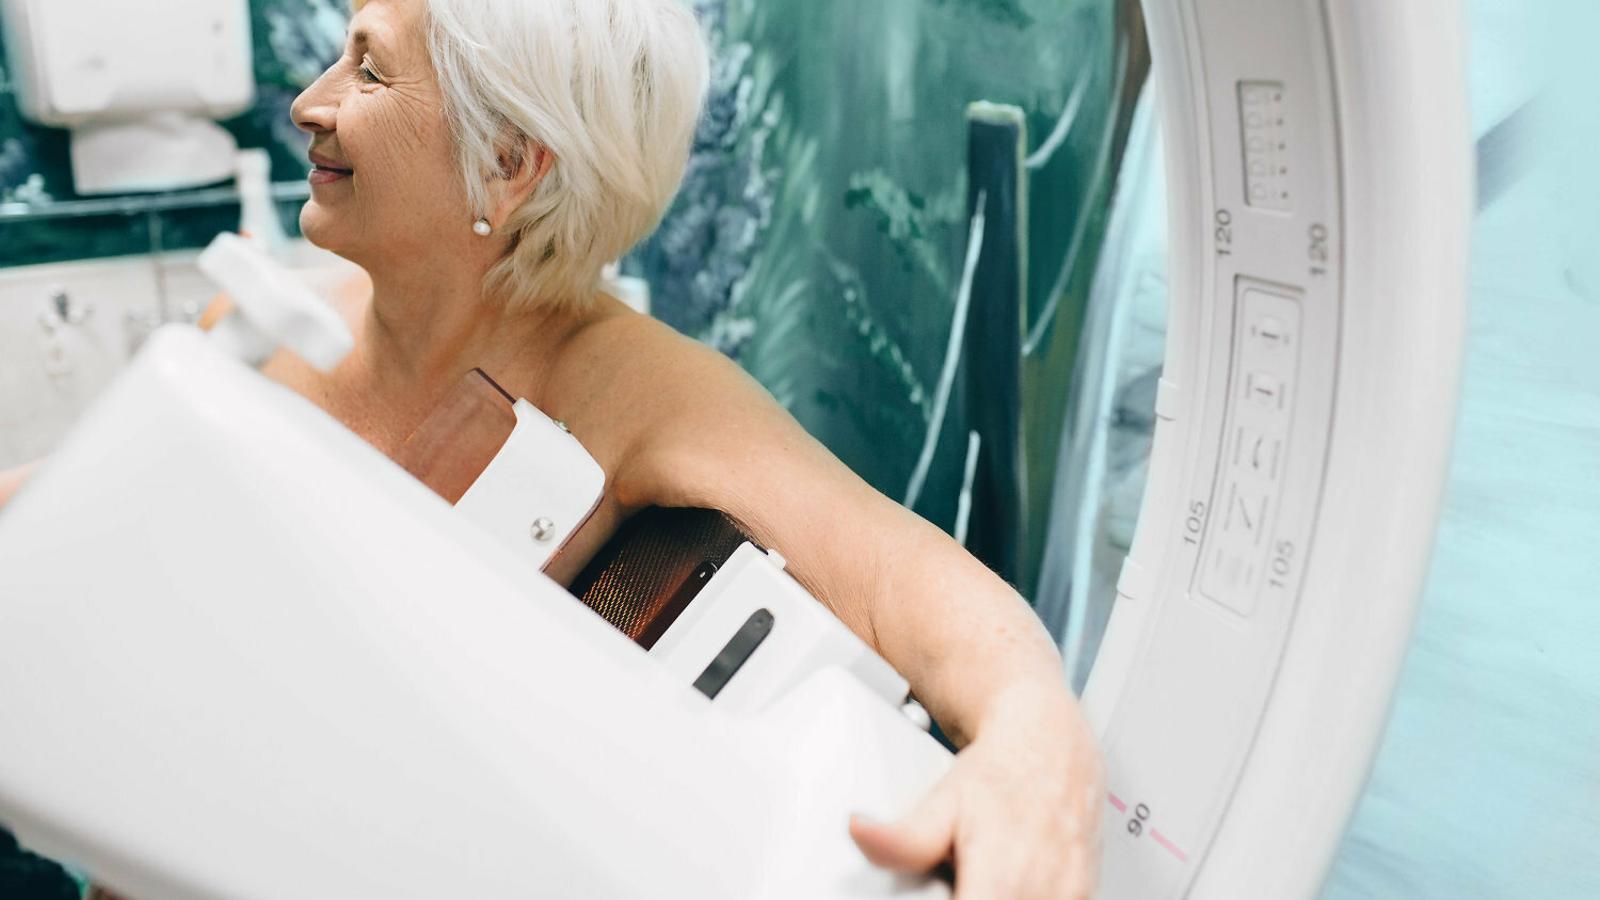 Identificat un gen director en el càncer de mama